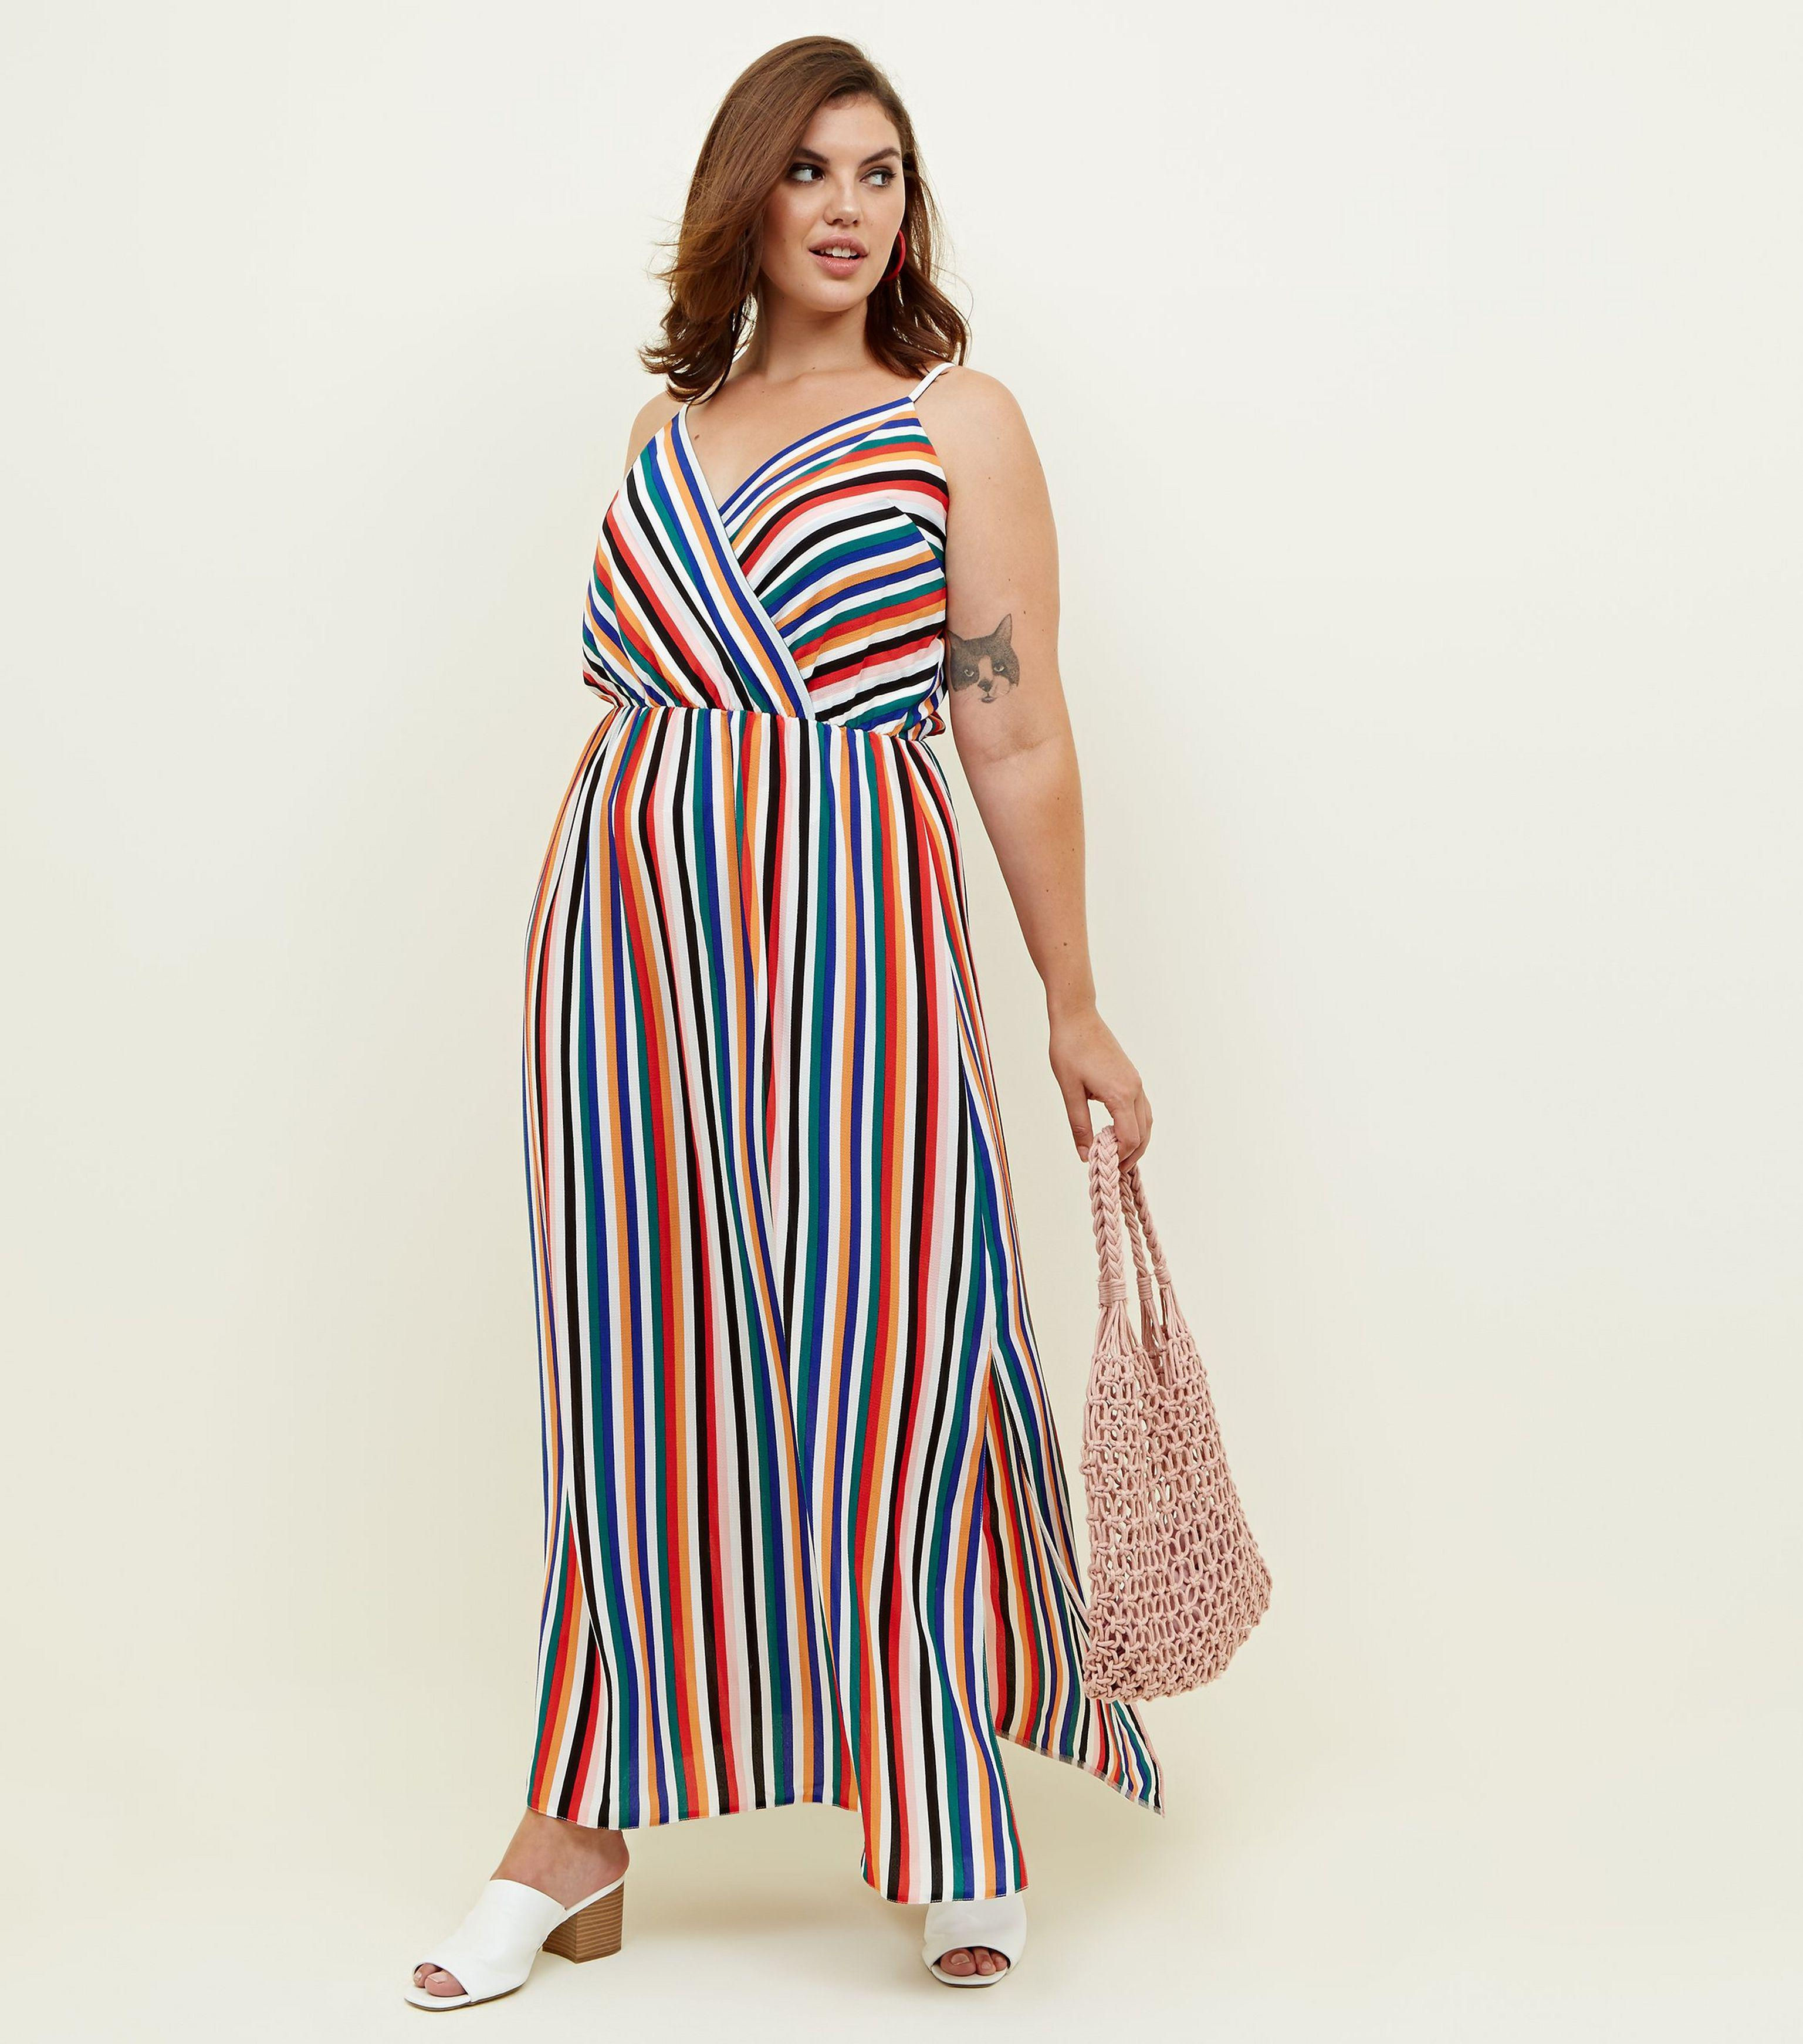 337ae78ce4 New Look Curves Rainbow Stripe Wrap Maxi Dress in Blue - Lyst